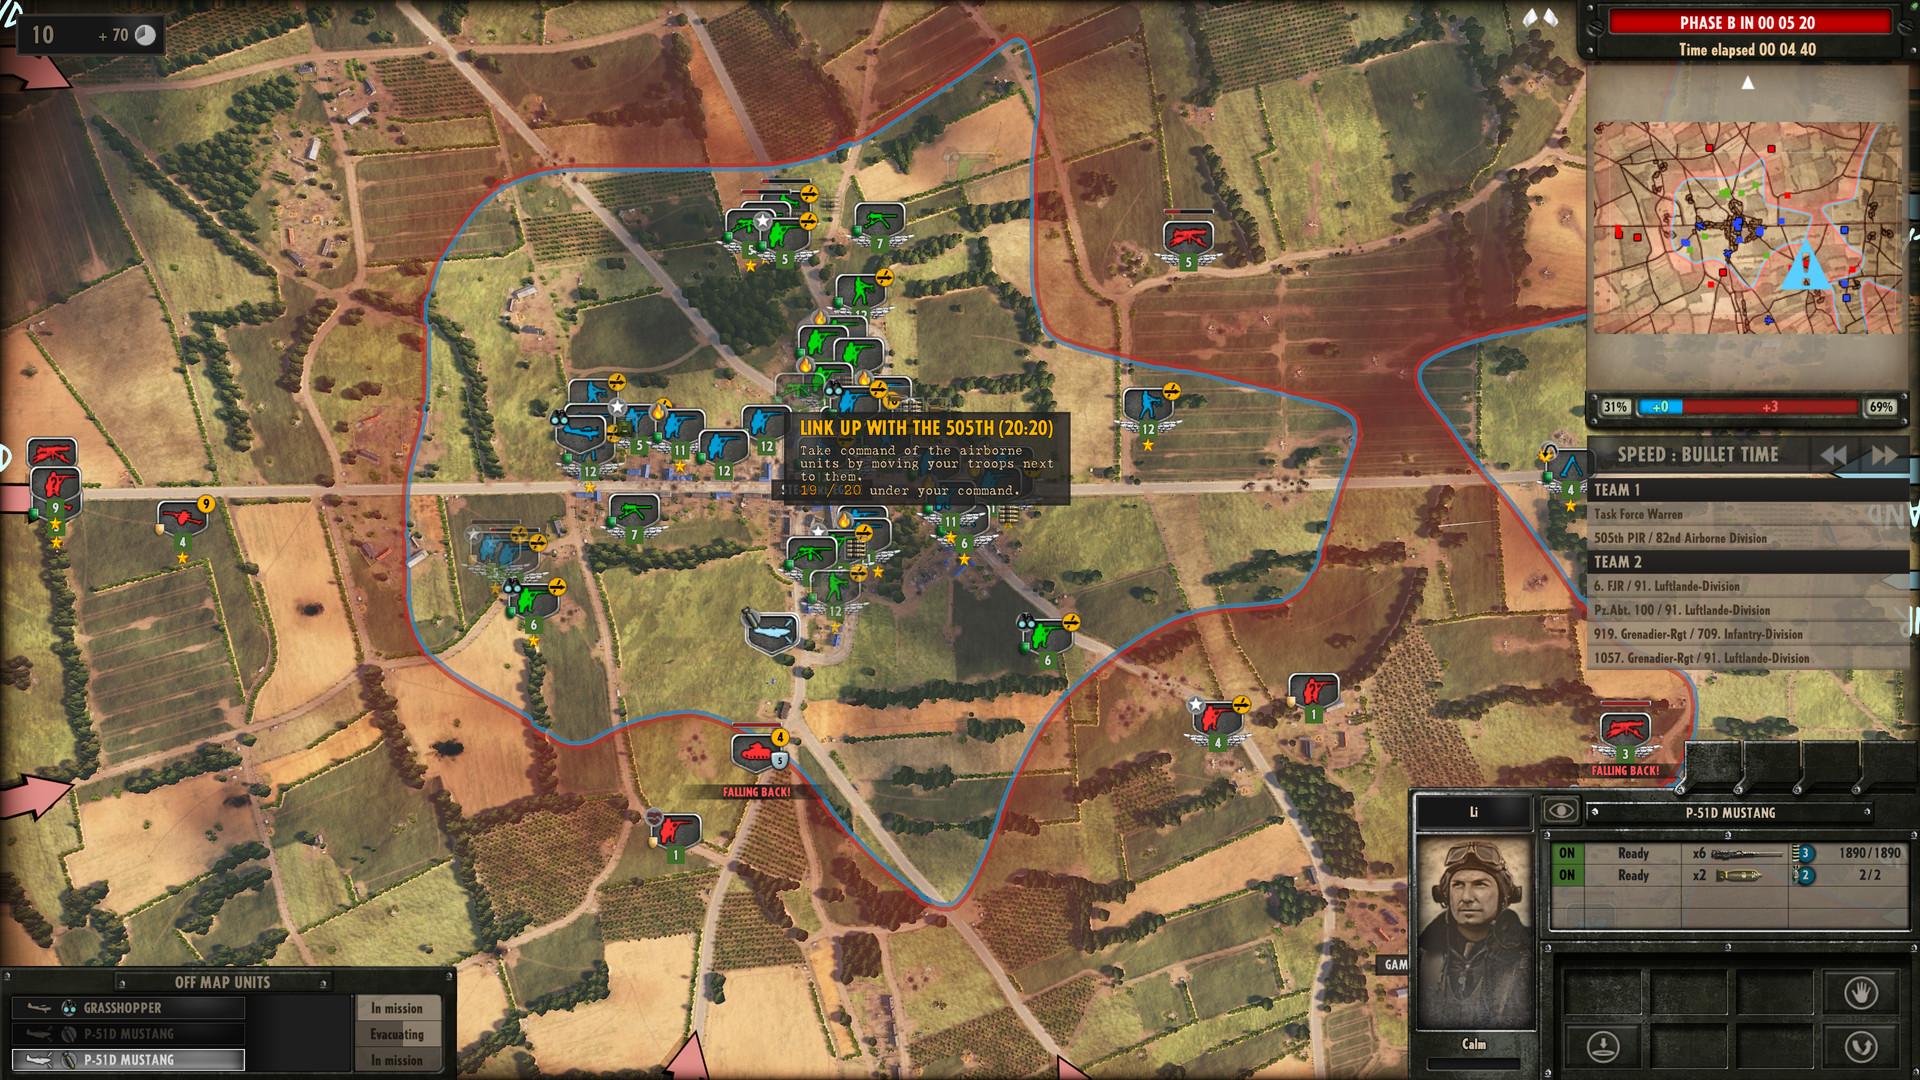 Steel Division: Normandy 44 Screenshot 2